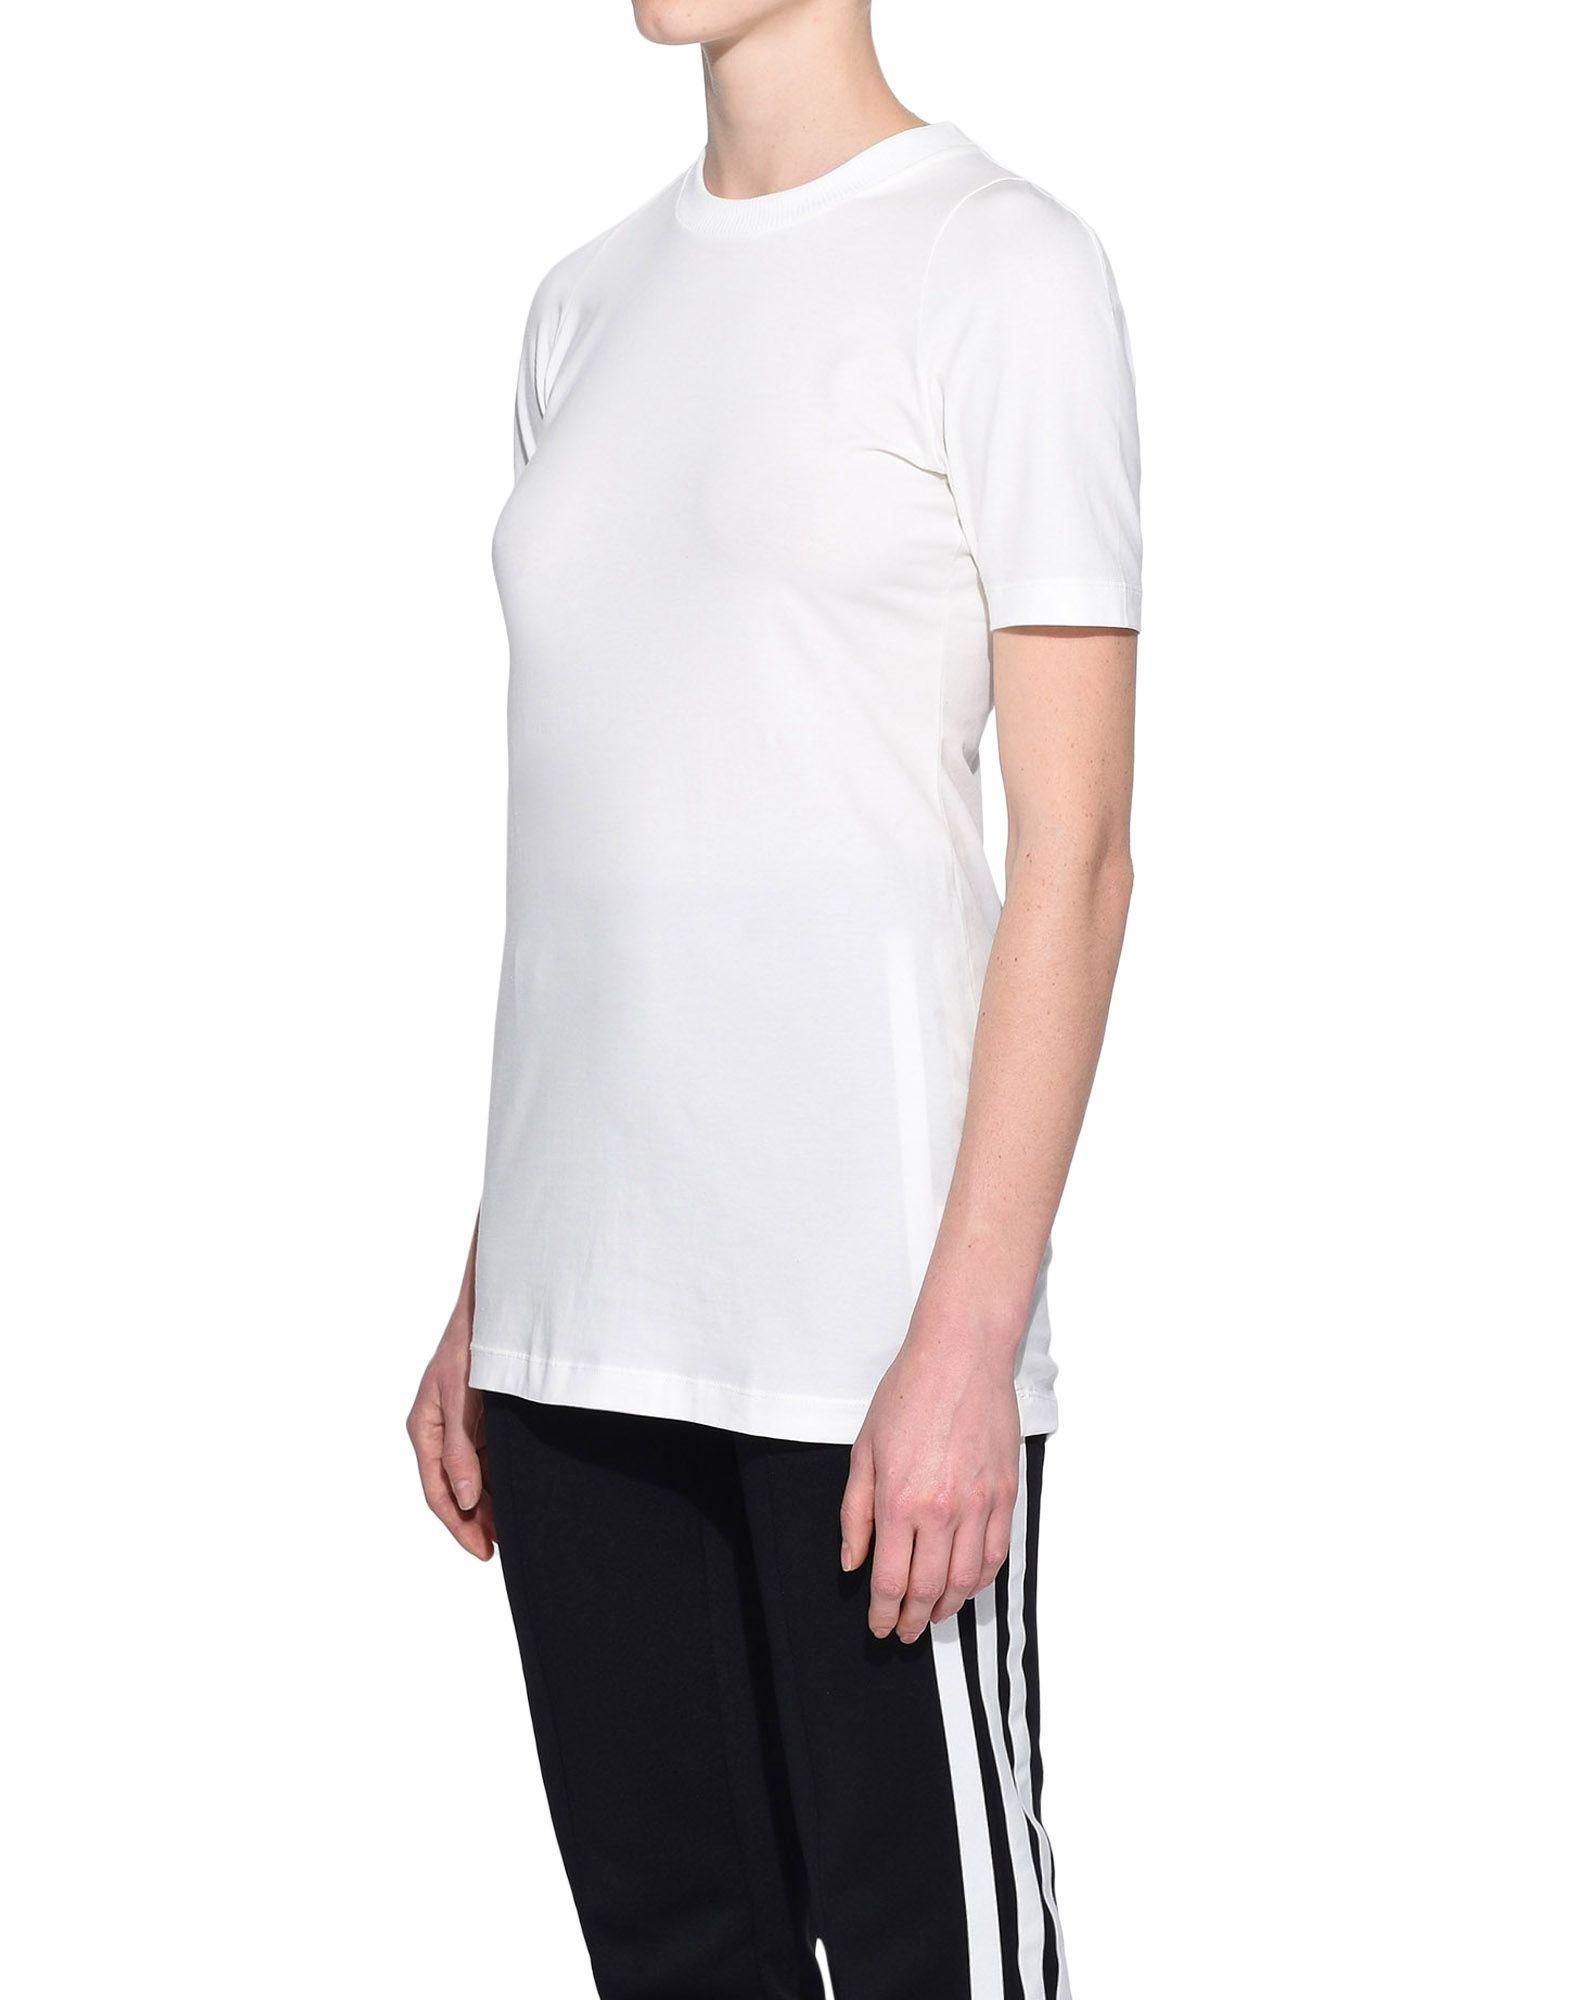 Y-3 Y-3 Prime Tee Short sleeve t-shirt Woman e